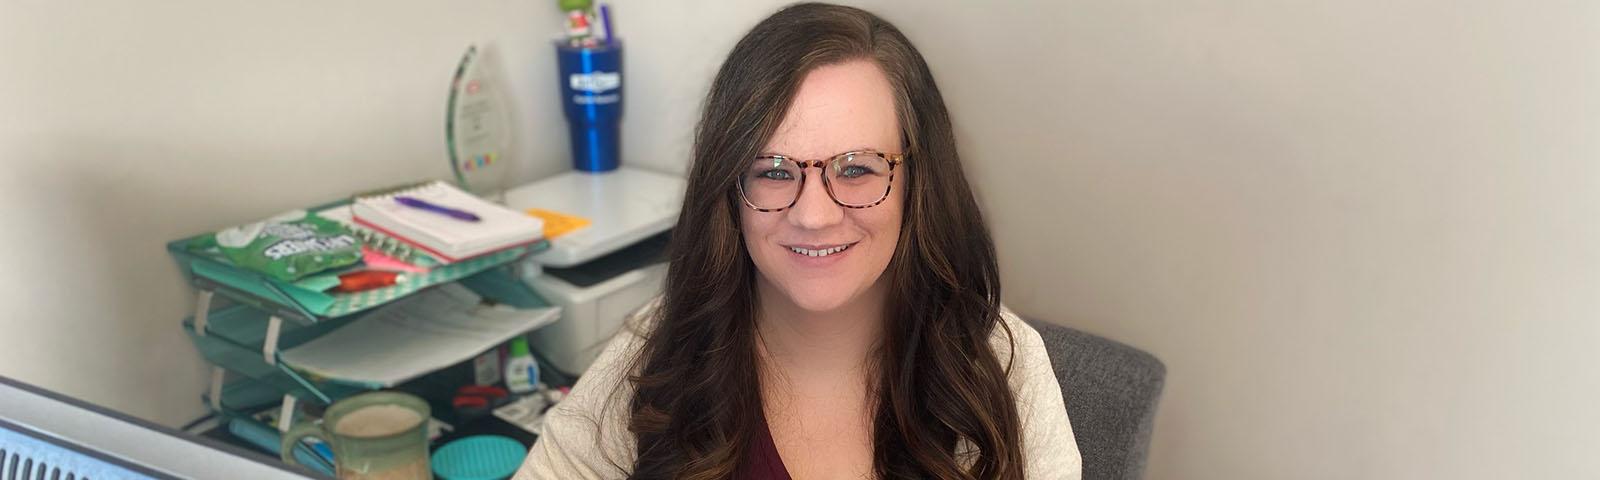 Julie, GetGo HR Administrative Coordinator